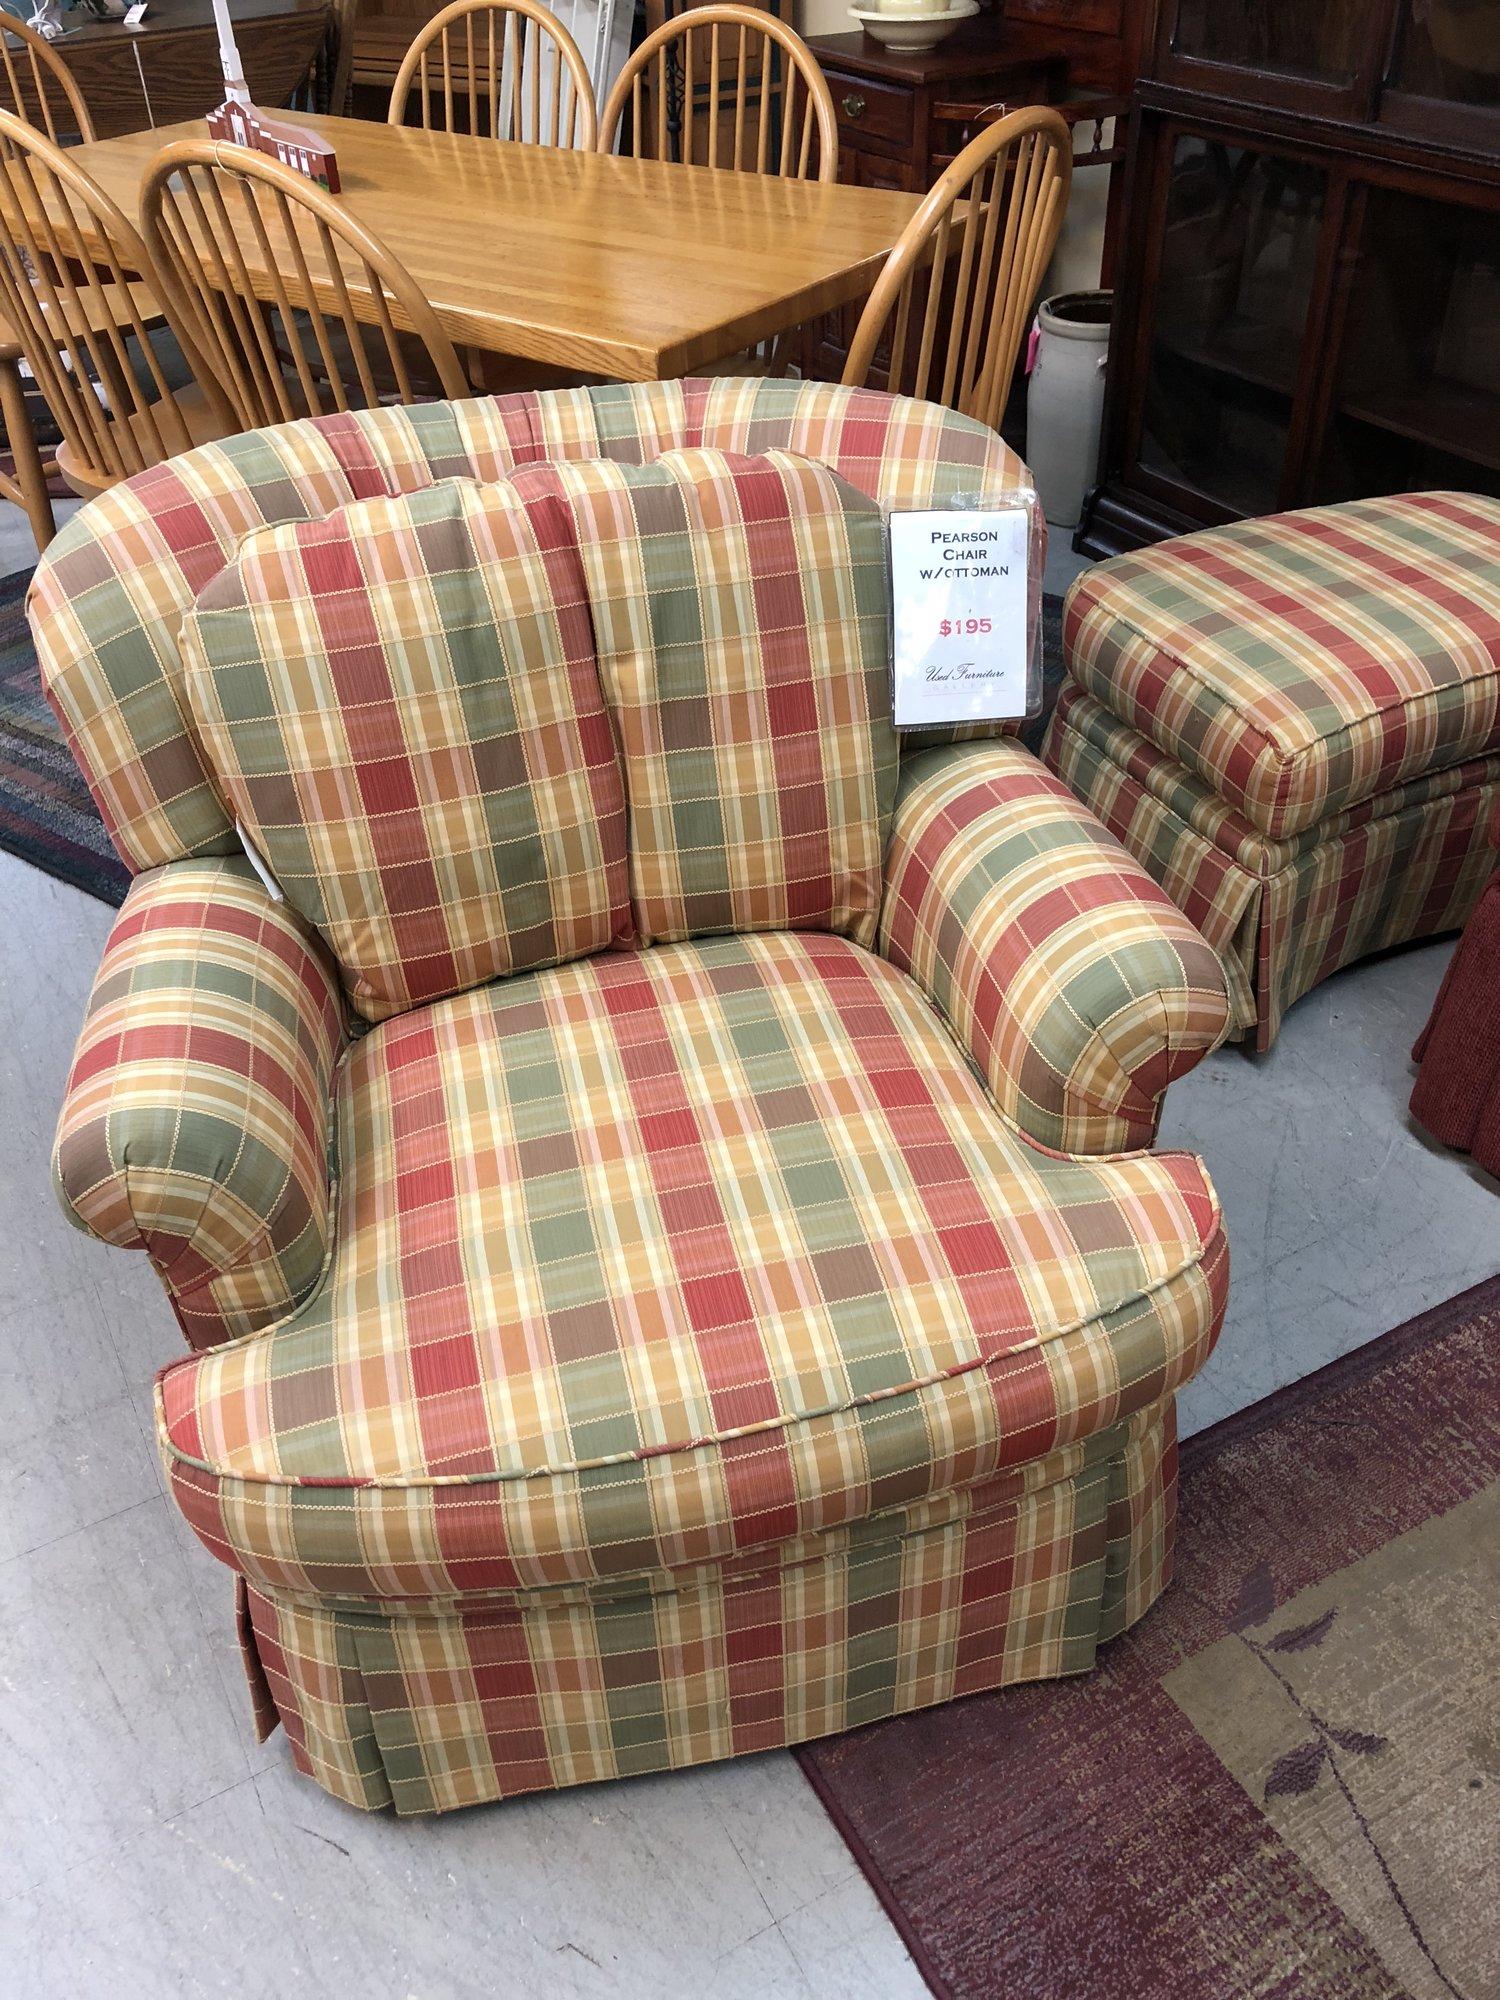 plaid orange website scottish furniture c masculine decoratorsbest sofa carpet red couch pattern fabrics traditional chair